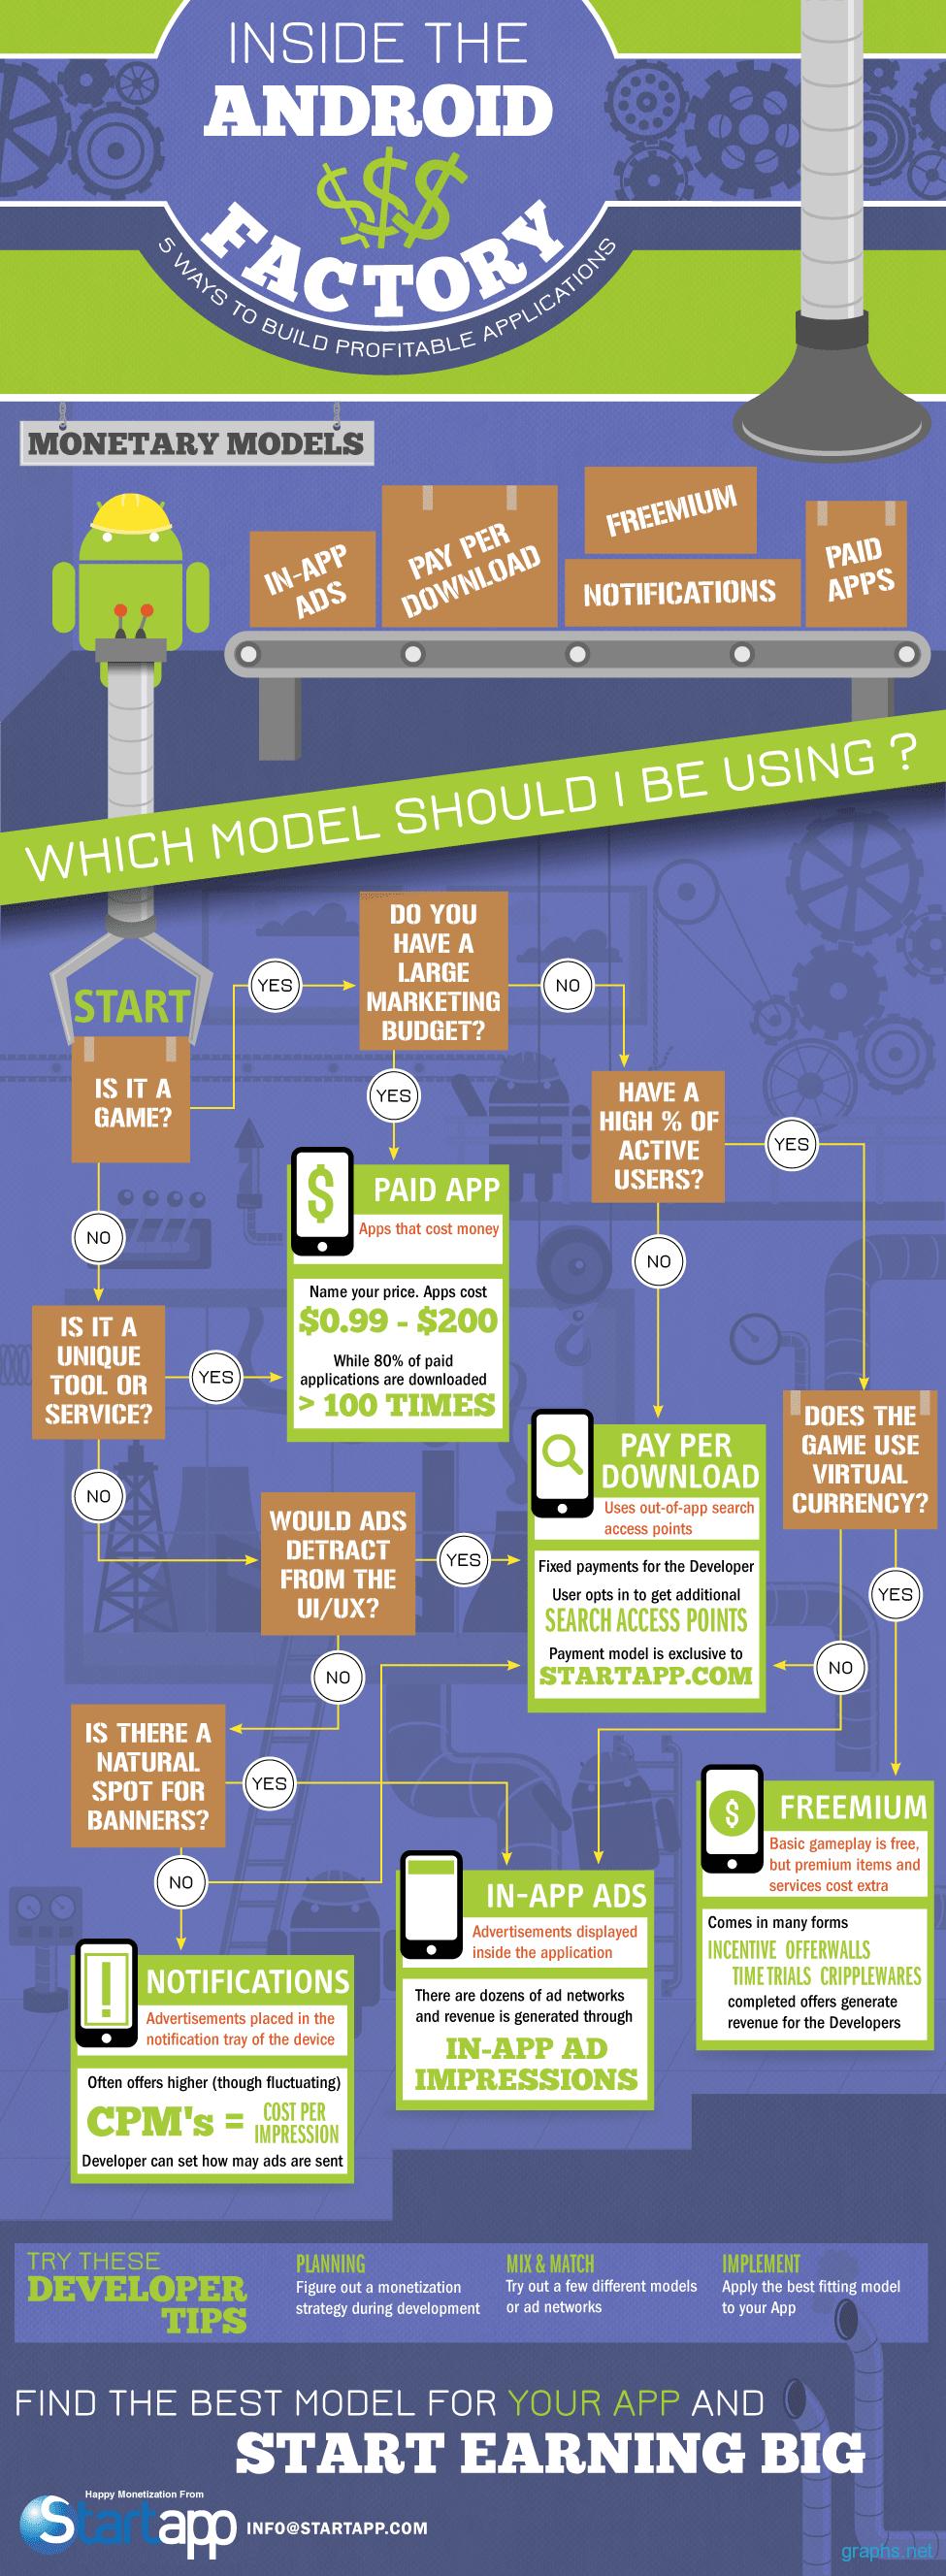 5 Ways to Build Profitable Apps